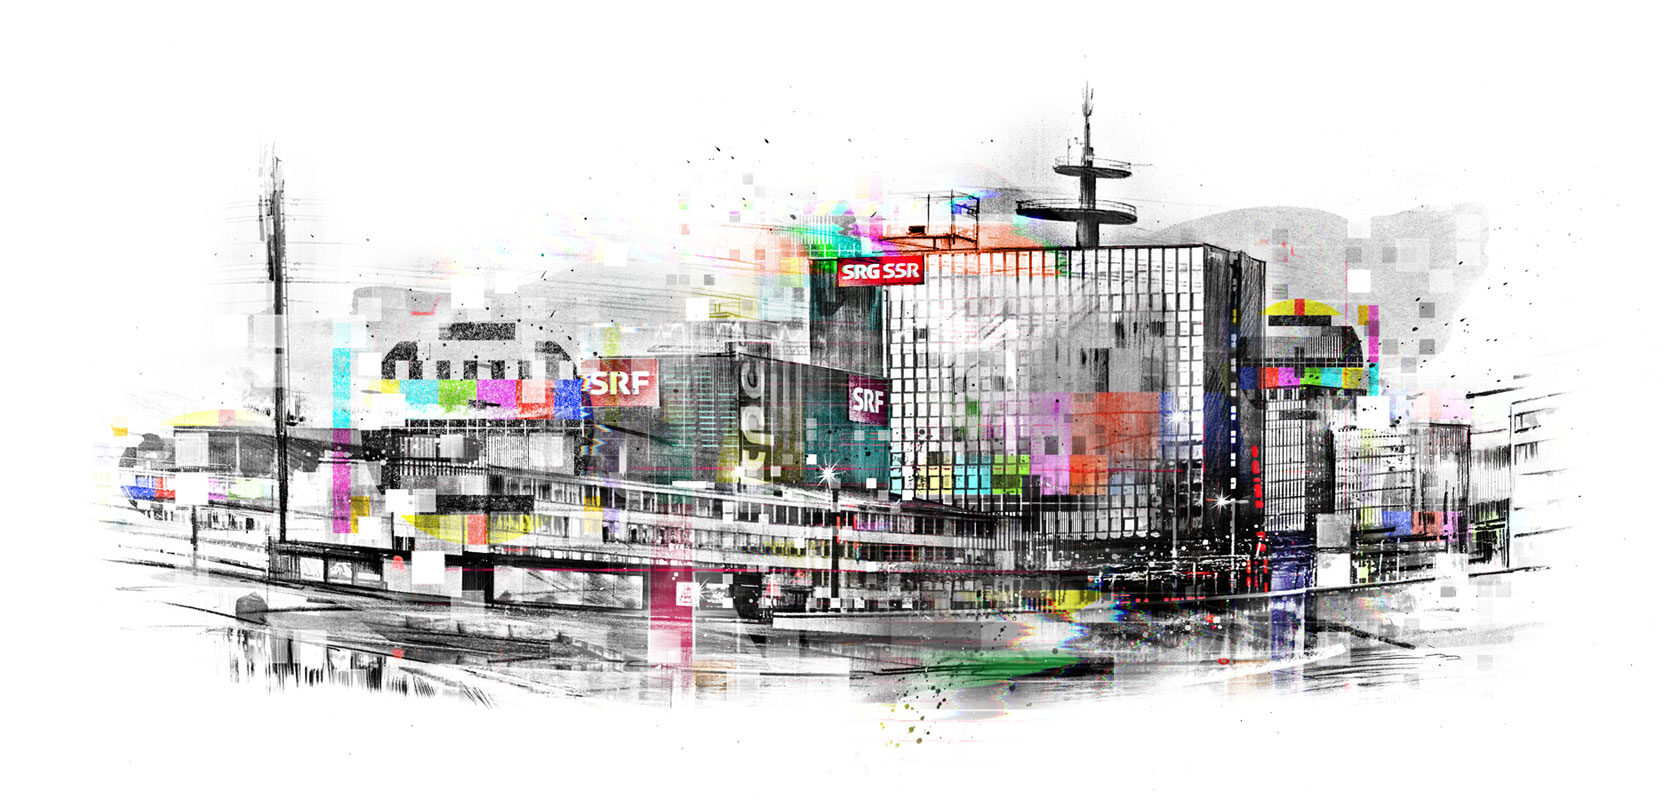 No Billag - Kornel Illustration | Kornel Stadler portfolio